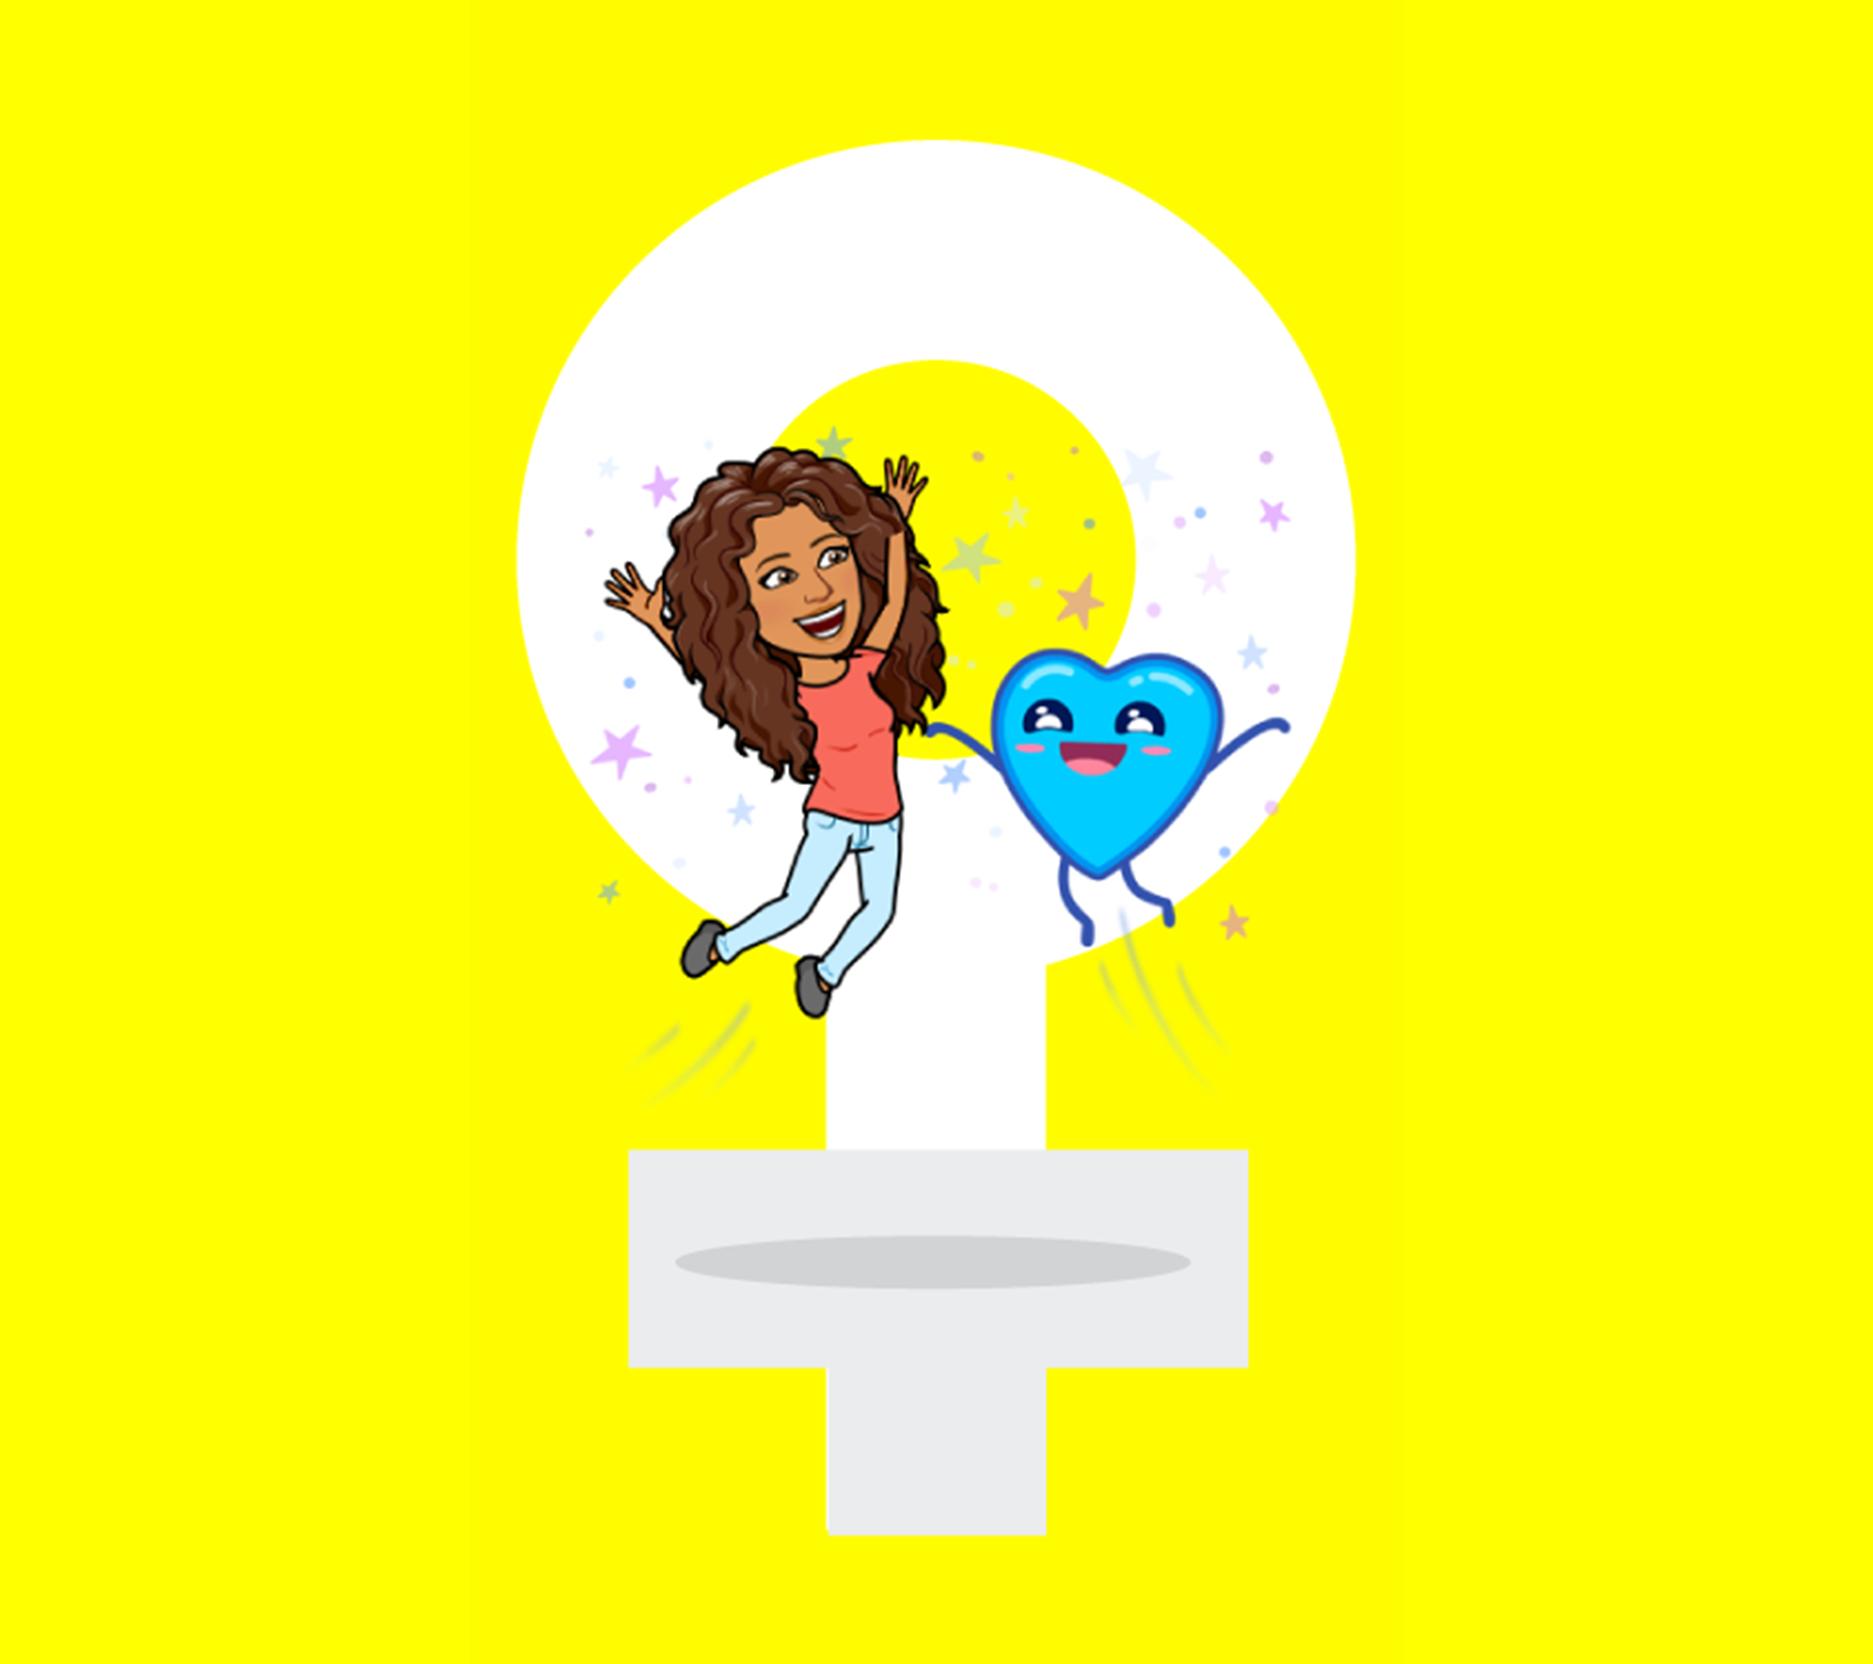 snapchatters-push-for-progress-on-international-womens-day